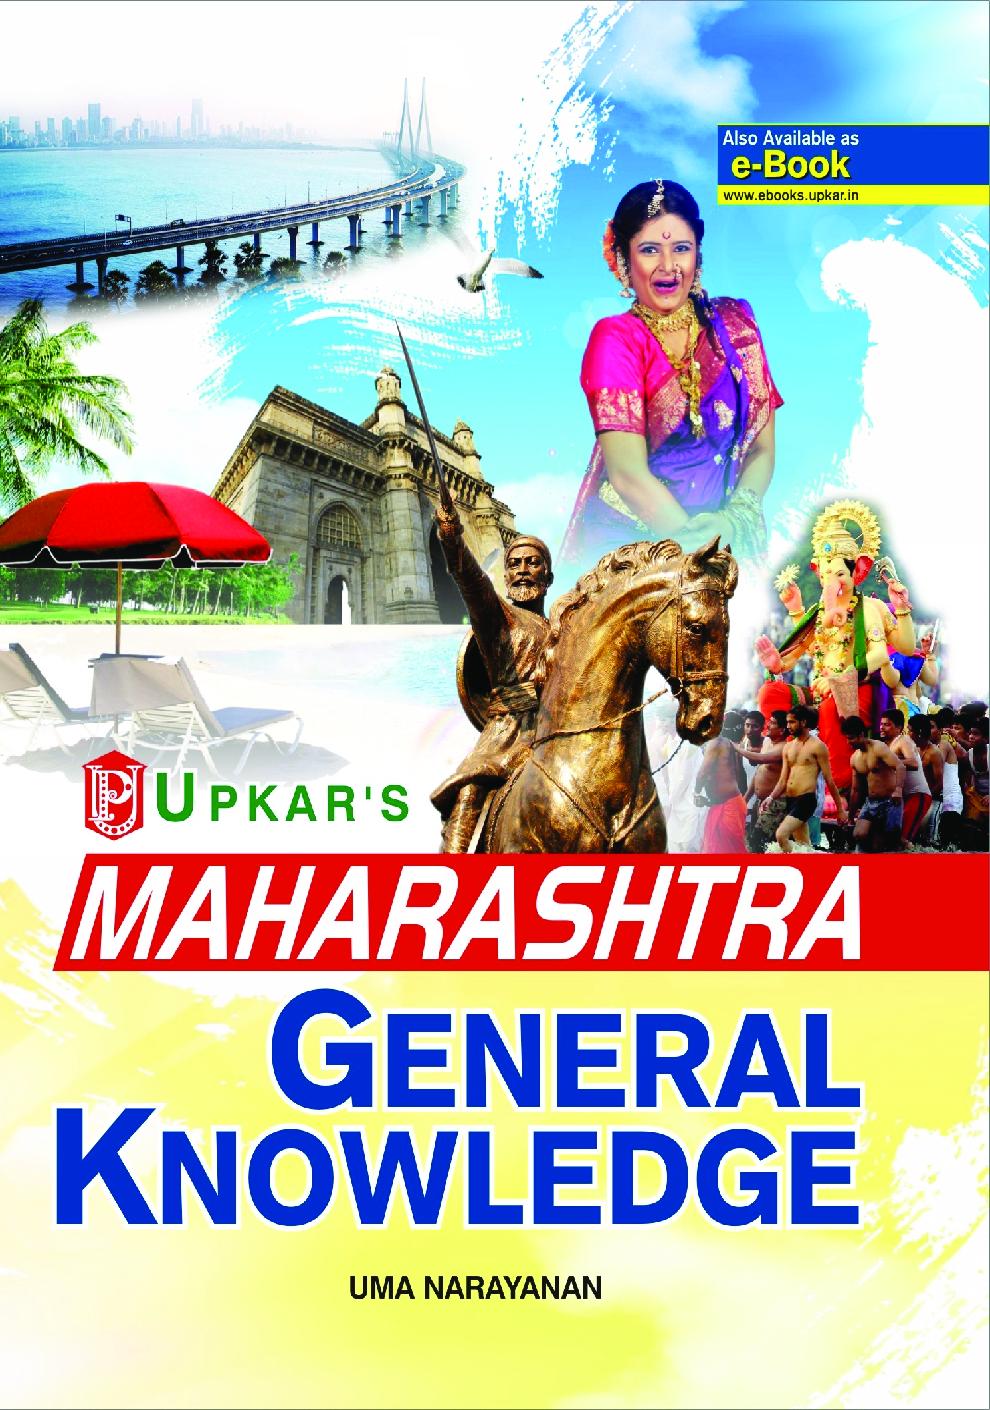 Maharashtra General Knowledge - Page 1